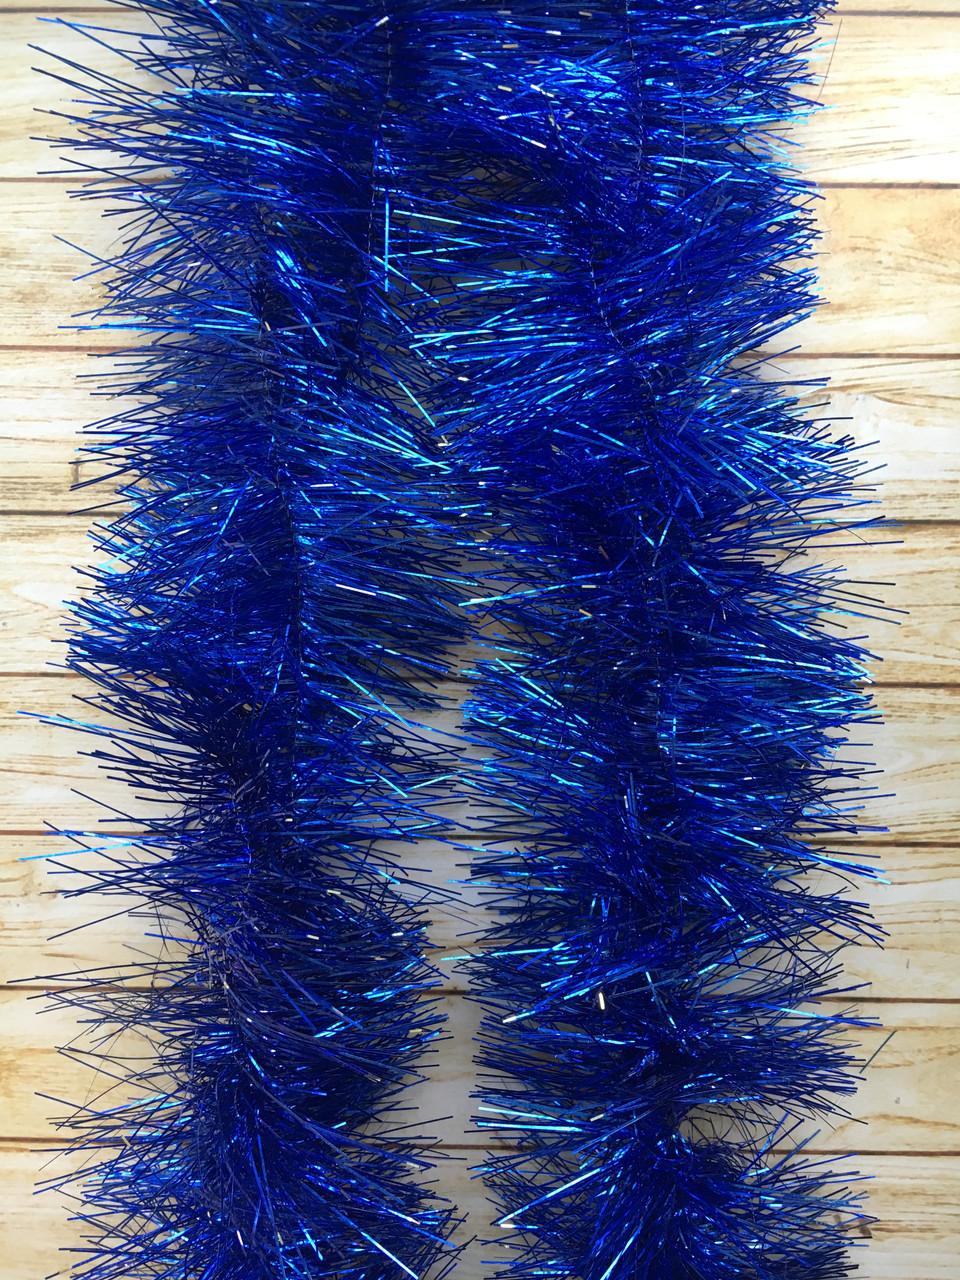 10 см диаметр Мишура дождик Синий, Длина 3 метра